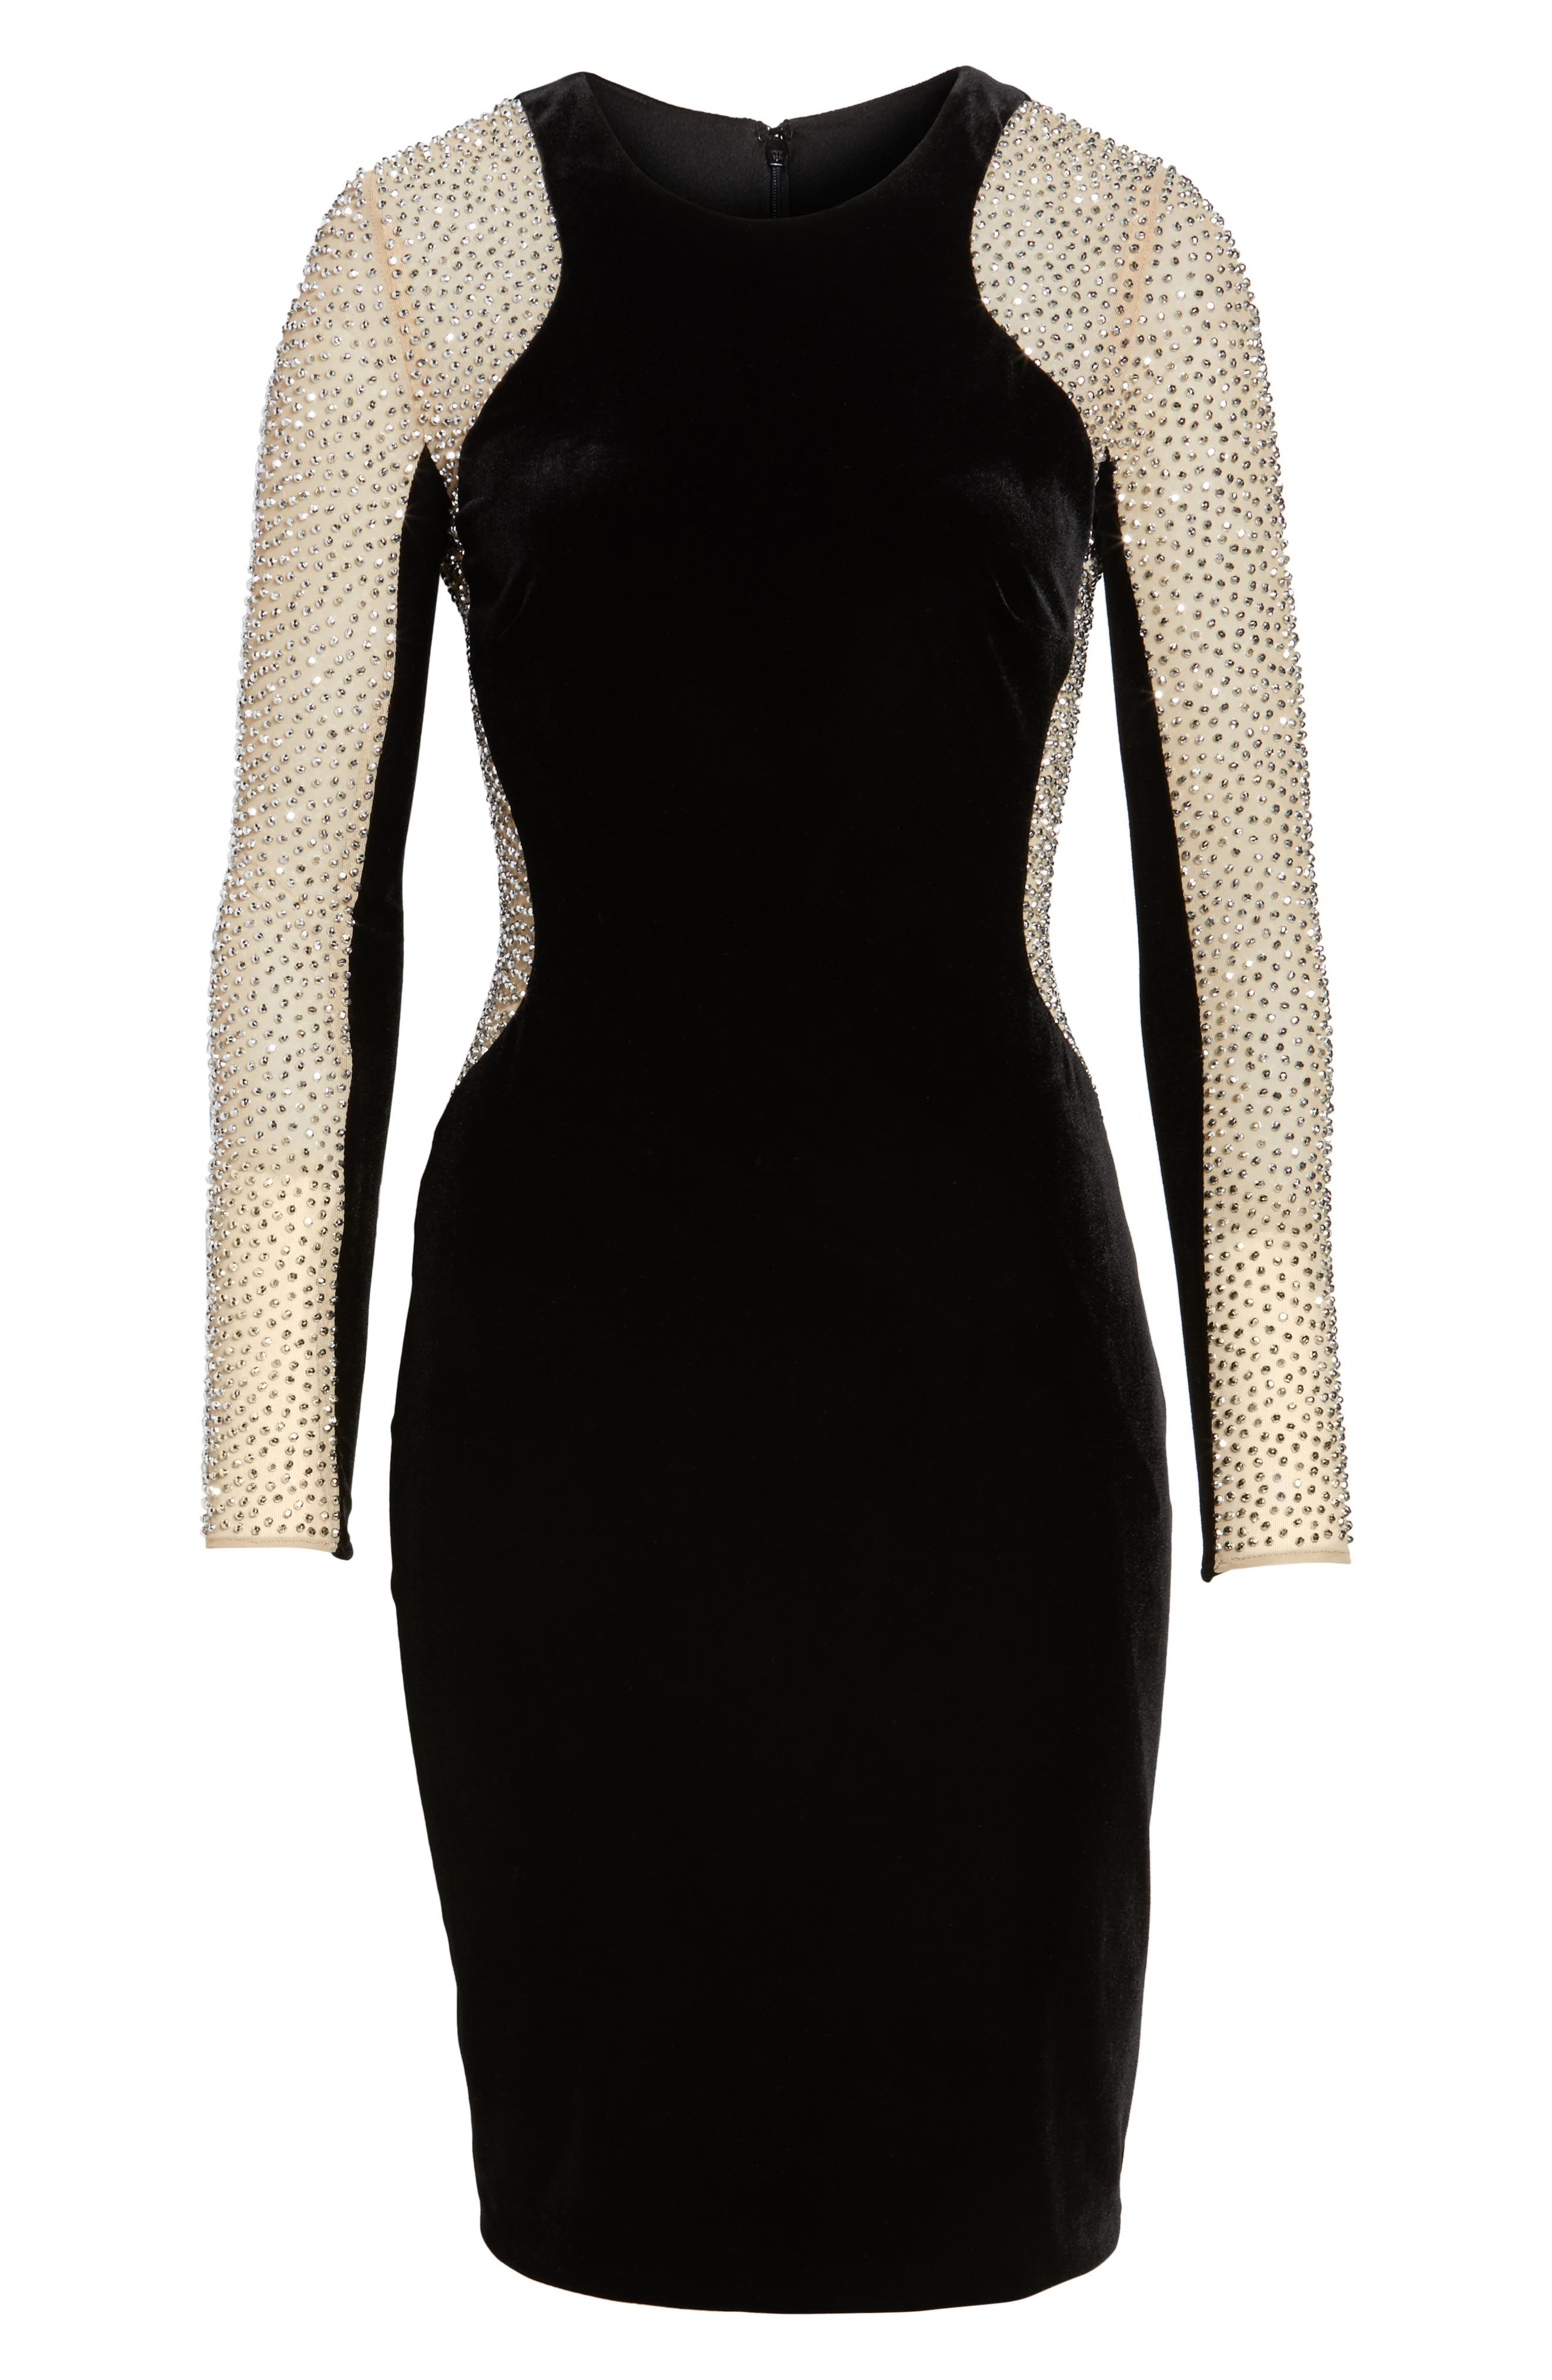 Caviar Bead Mesh Velvet Body-Con Dress,                             Alternate thumbnail 6, color,                             BLACK/ NUDE/ SILVER